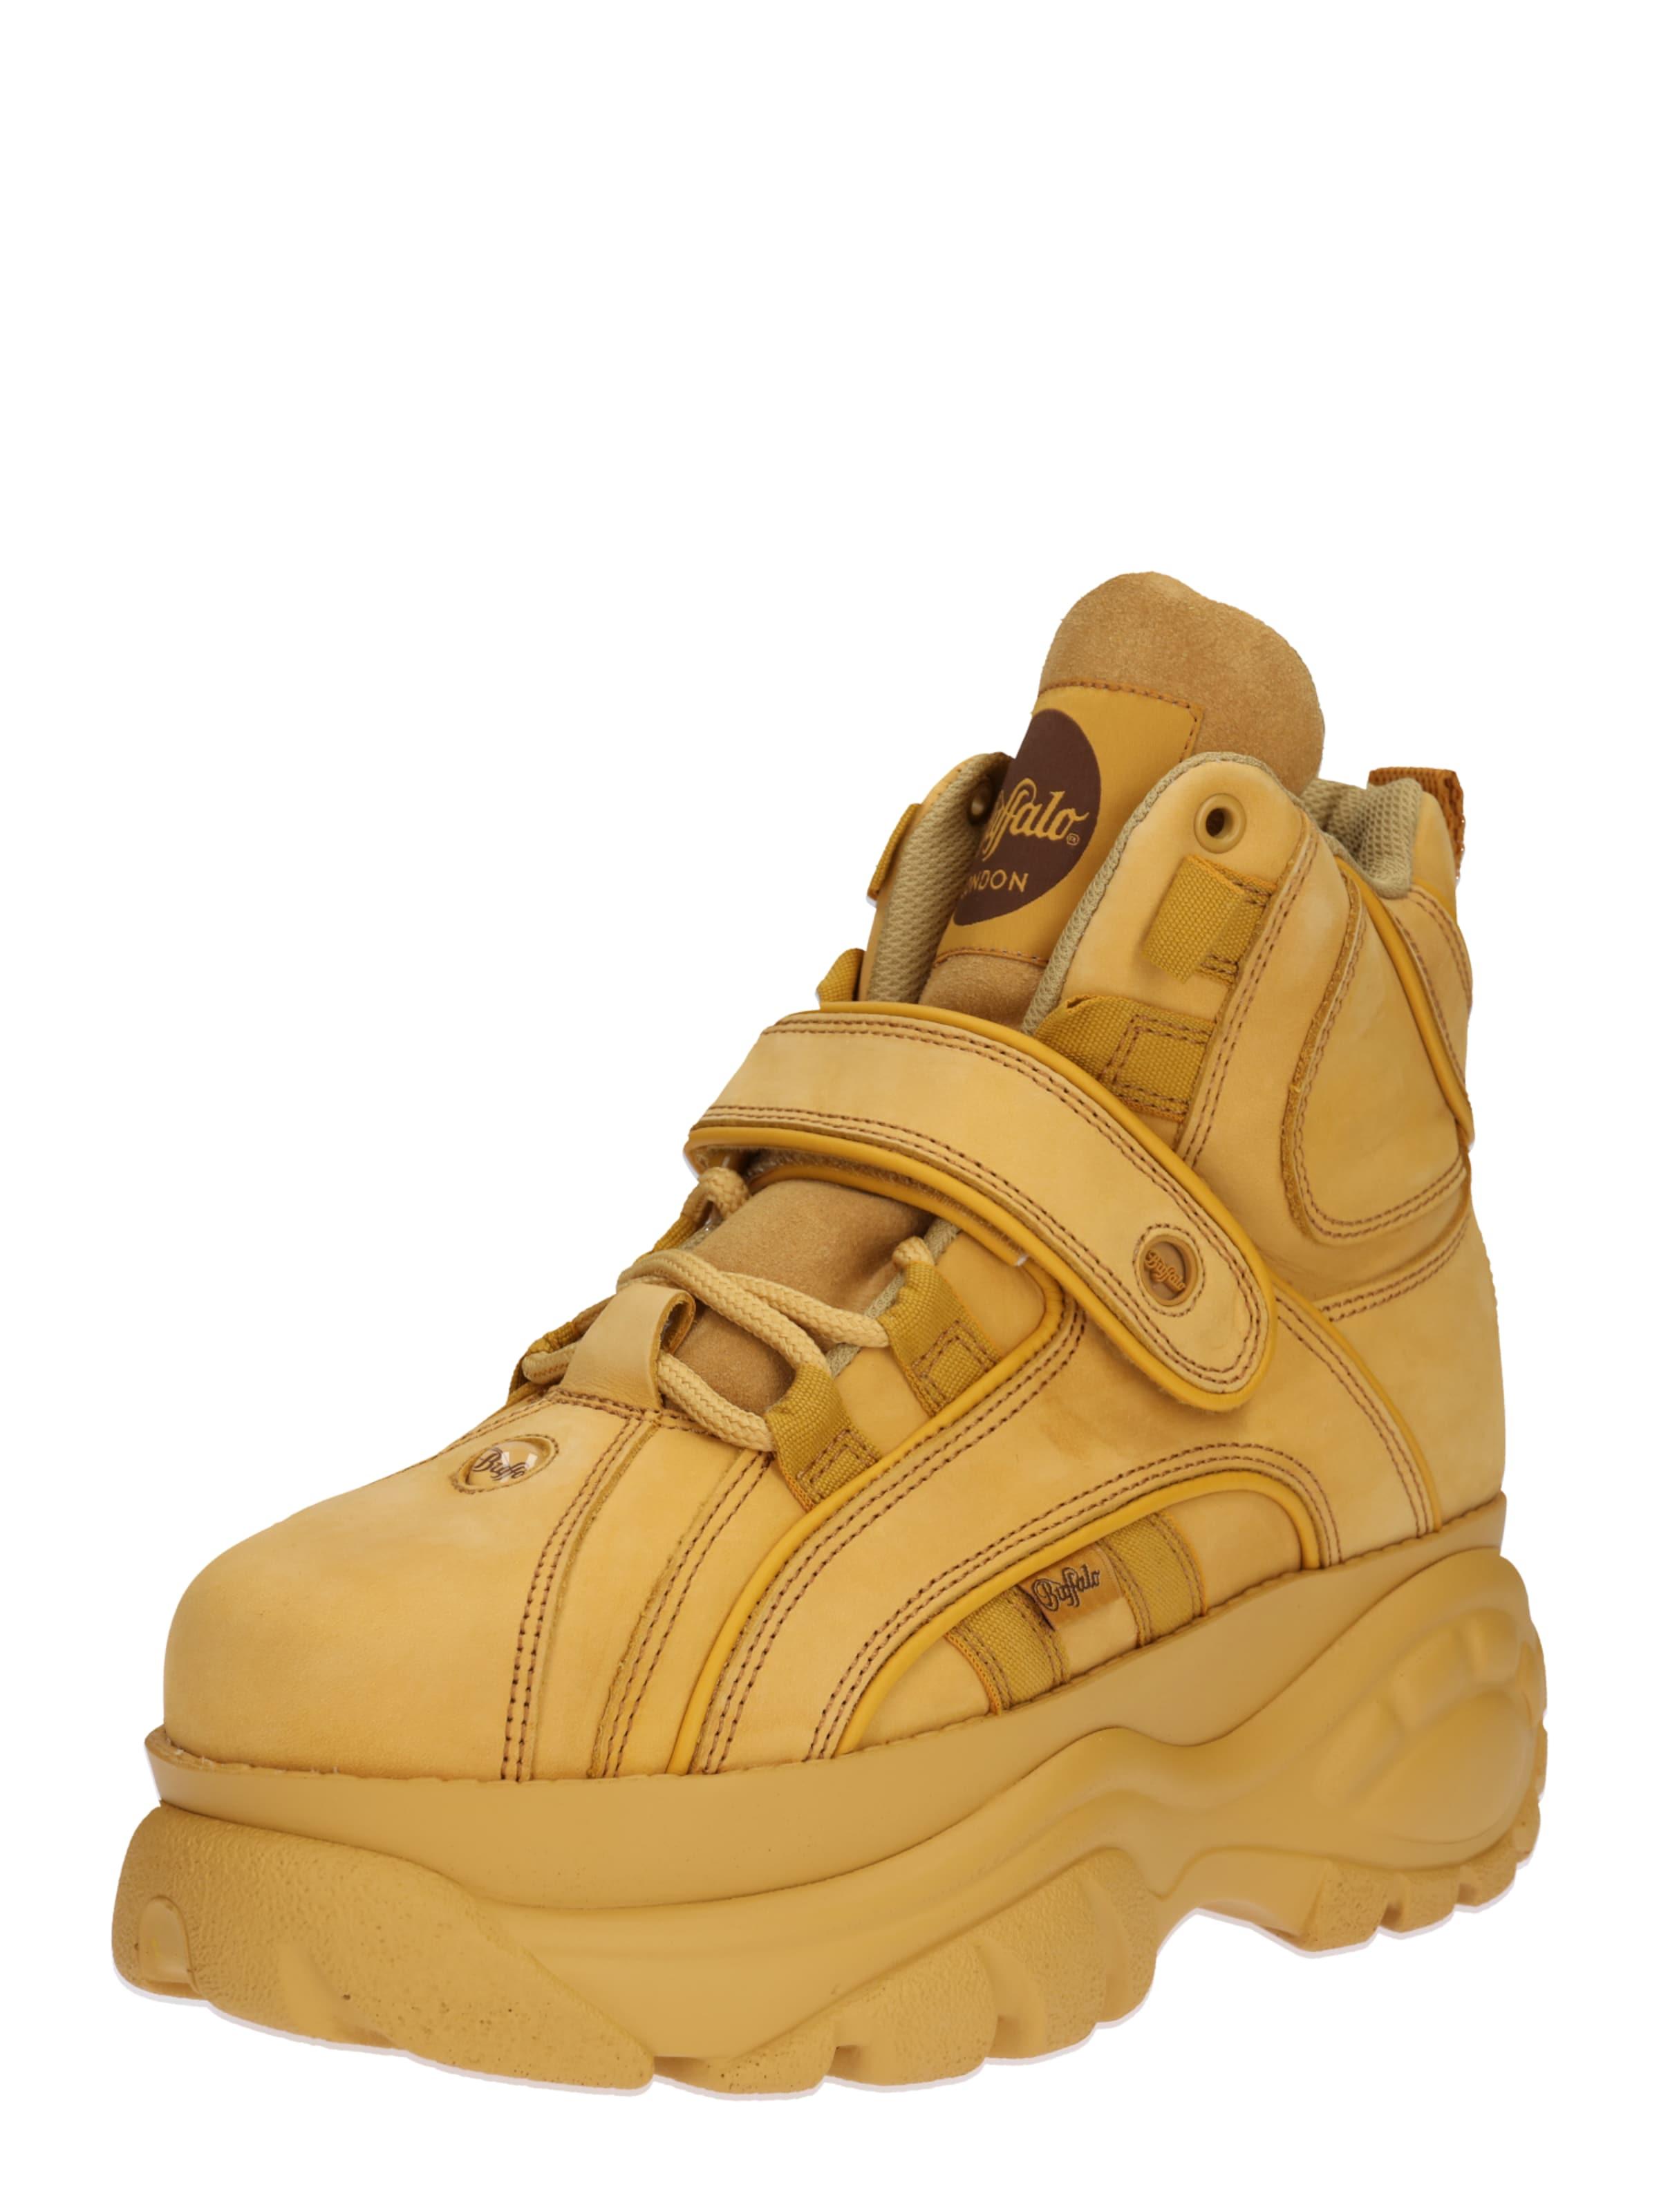 In Buffalo Geel London Sneakers Hoog n0OPk8w